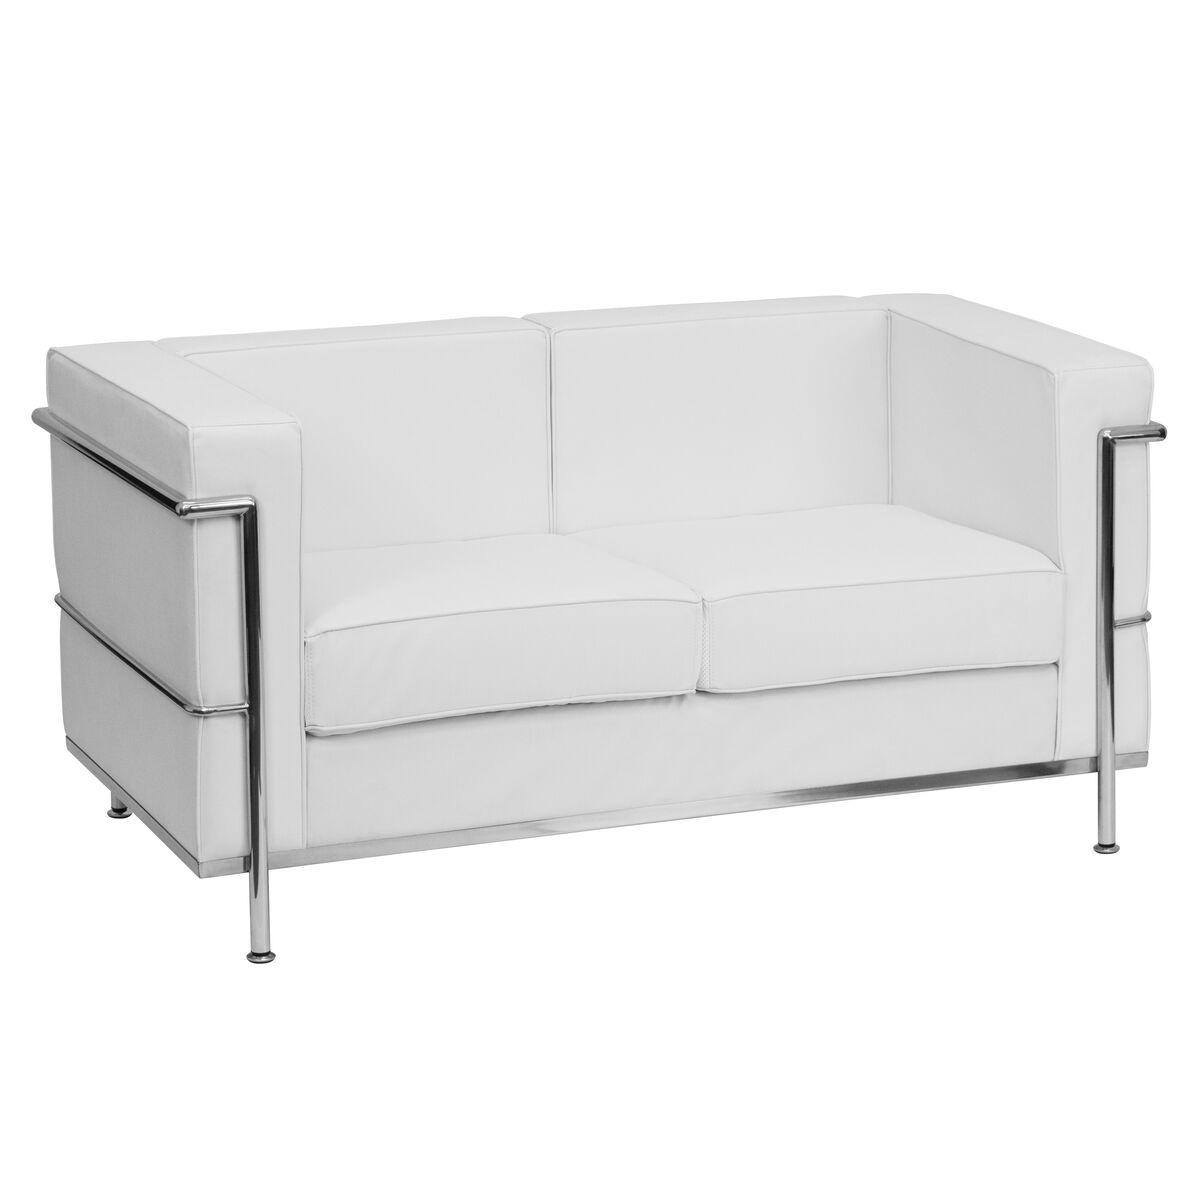 Flash Furniture Hercules Regal Series Contemporary Melrose